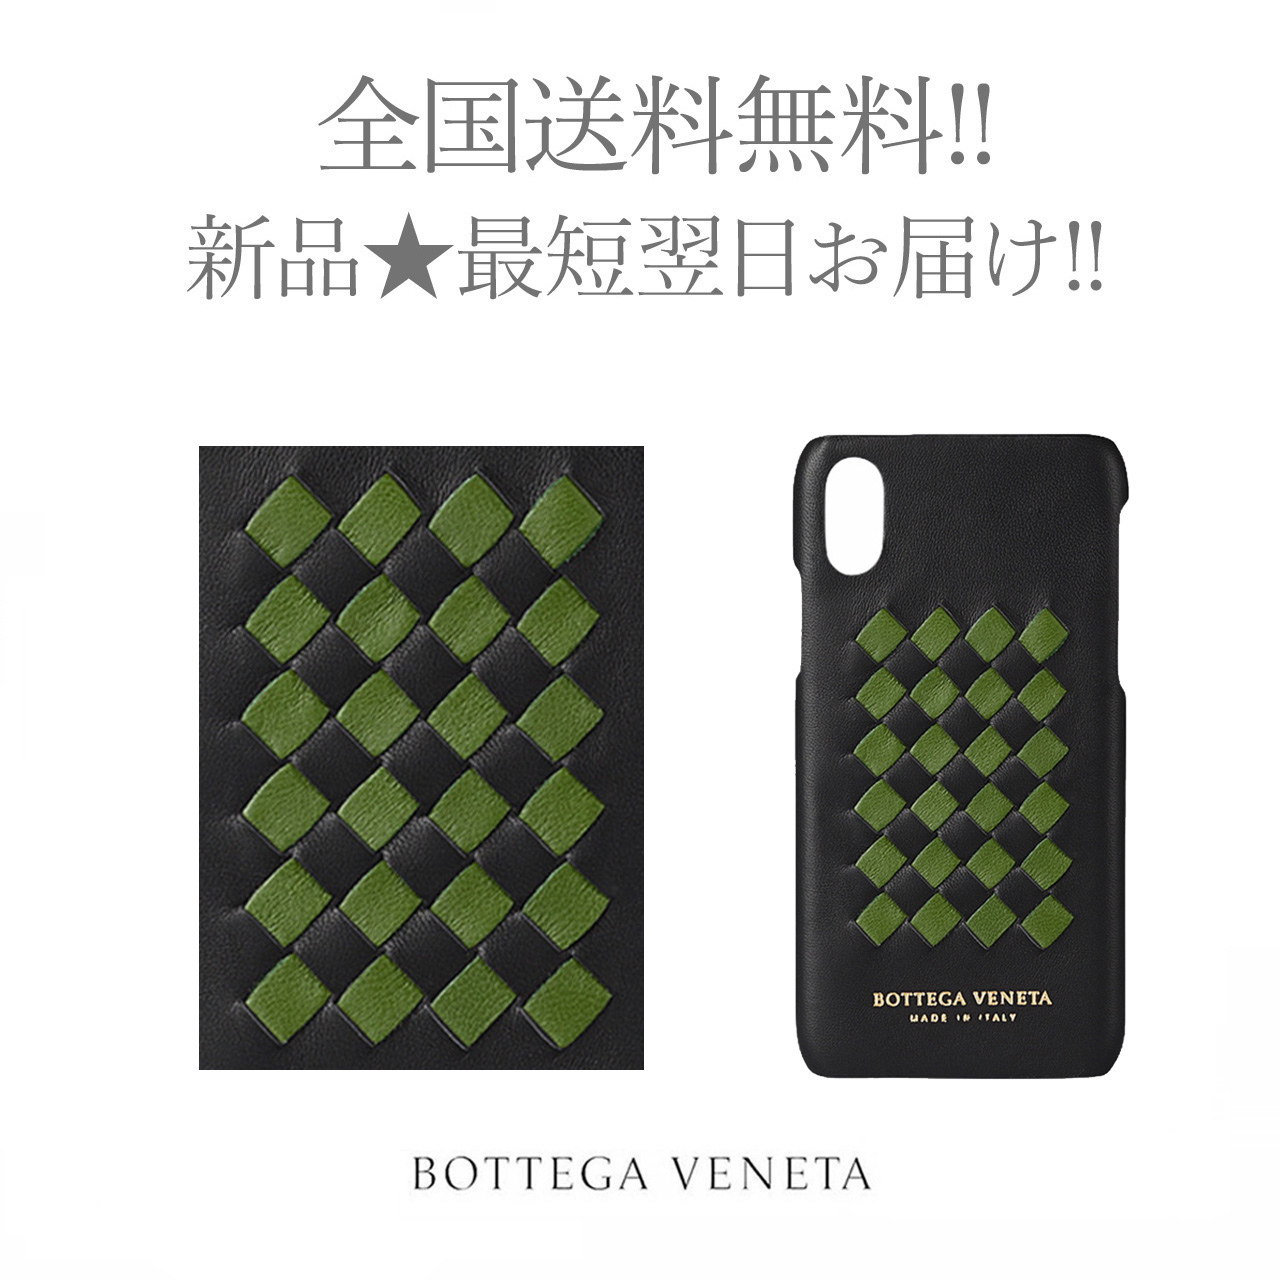 BOTTEGA VENETA ボッテガ ヴェネタ セール開催中最短即日発送 輸入 iPhone X XS ケース チェック イントレ メンズ ナッパ 1199 ファーン ブラック 男 × 新品 イタリア製